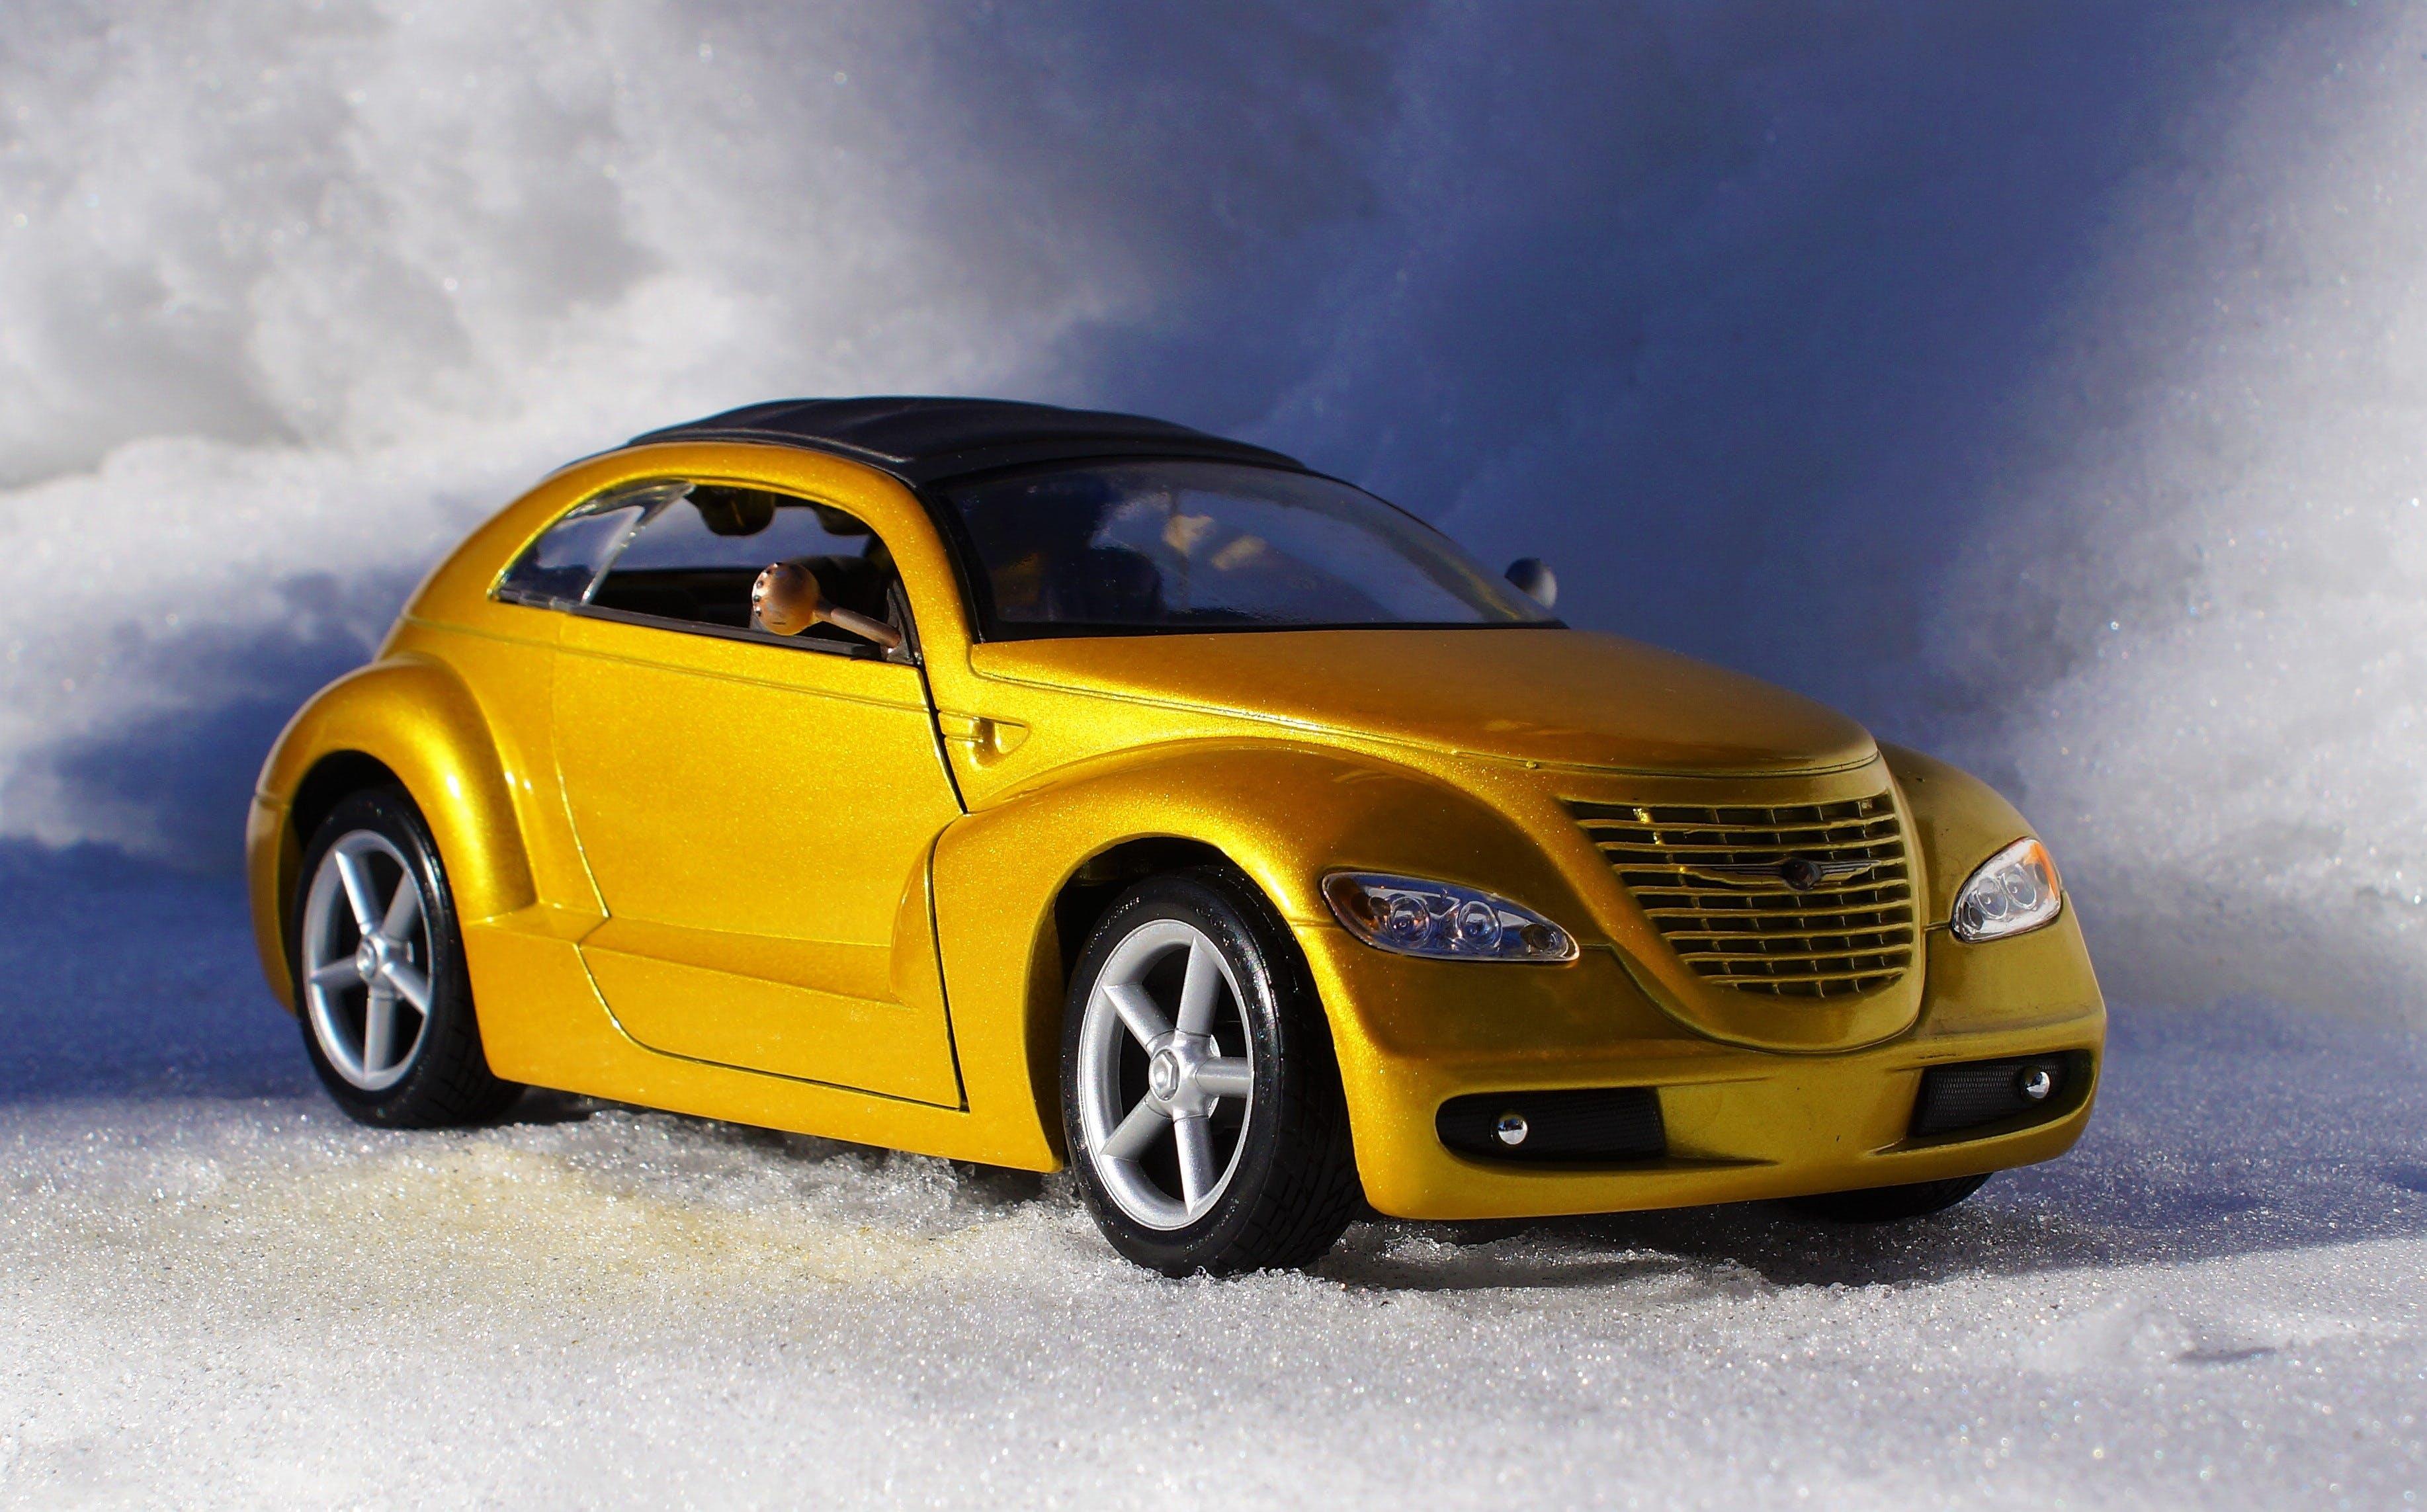 Free stock photo of model, vehicle, toys, sports car